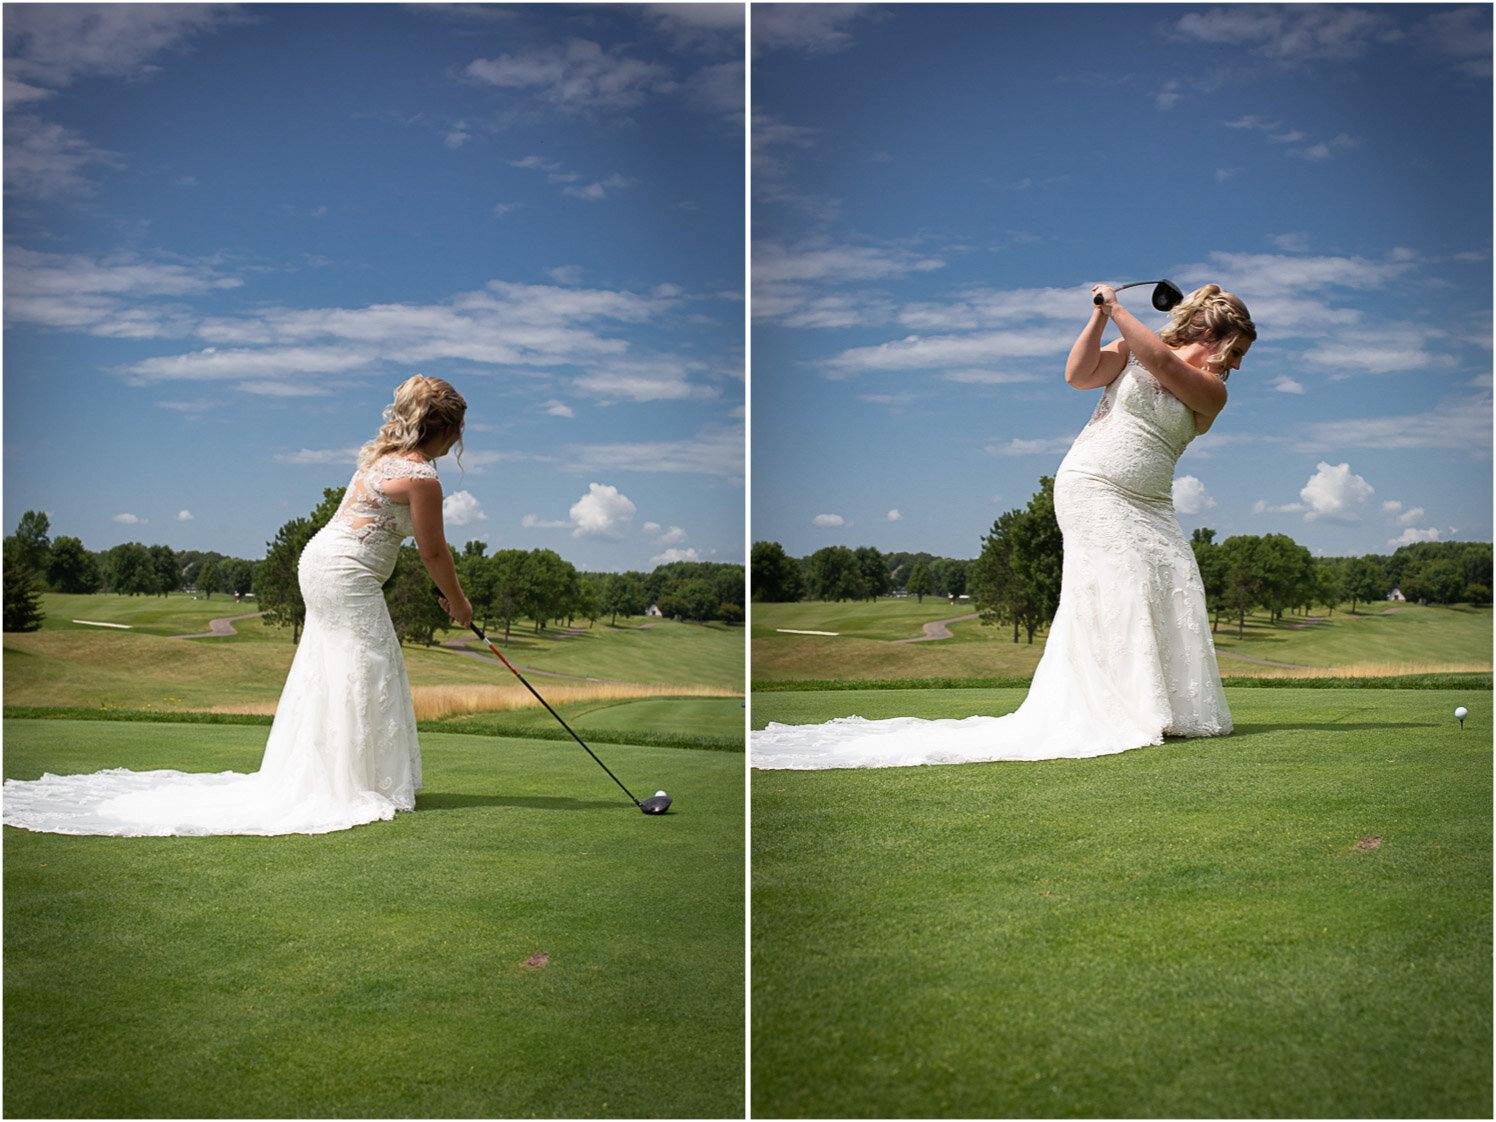 17-rush-creek-golf-course-bride-tee-off-golfing-mahonenphotography-mn-wedding-photographer.jpg